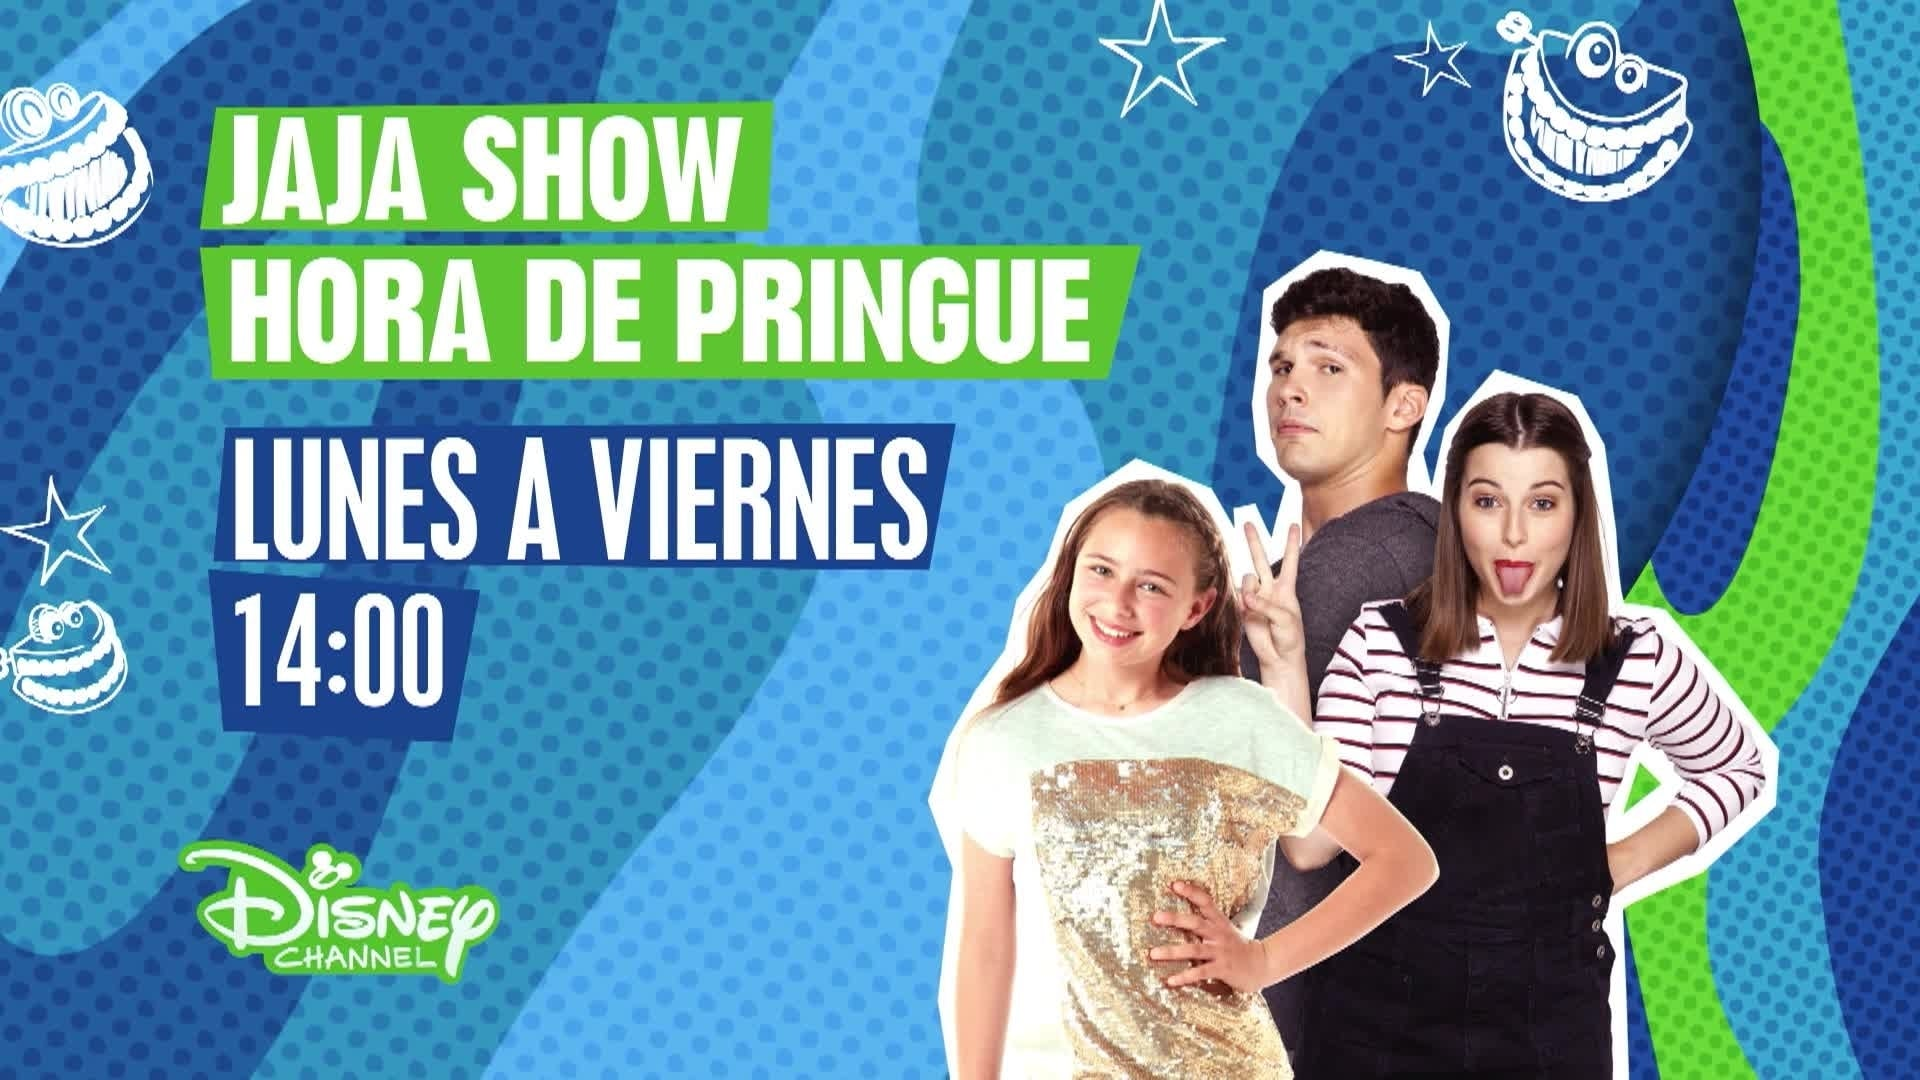 """JaJa Show Hora de pringue"" en Disney Channel"